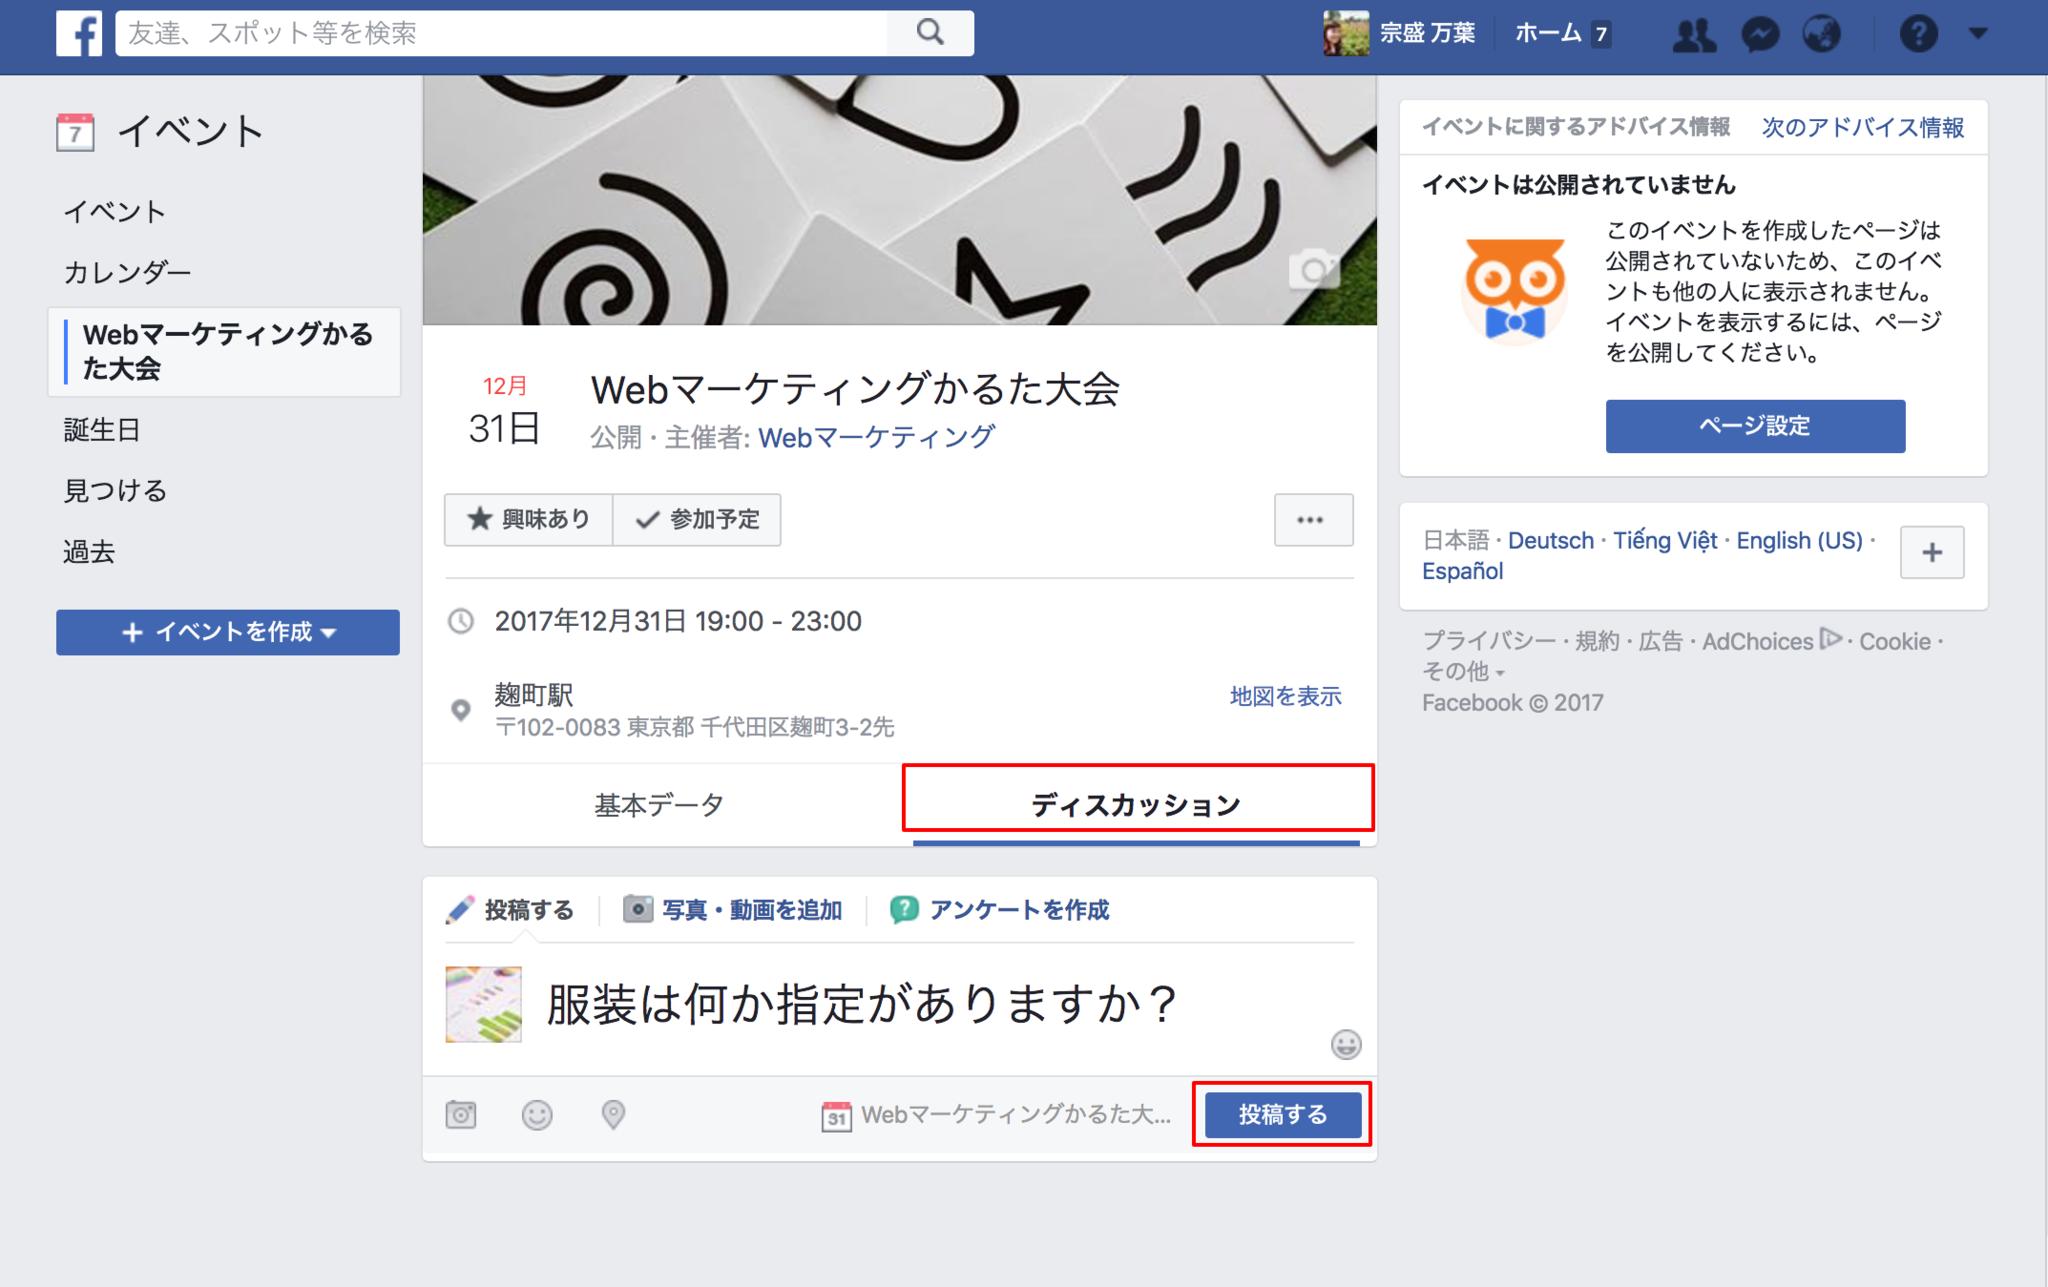 Webマーケティングかるた大会_(2).png